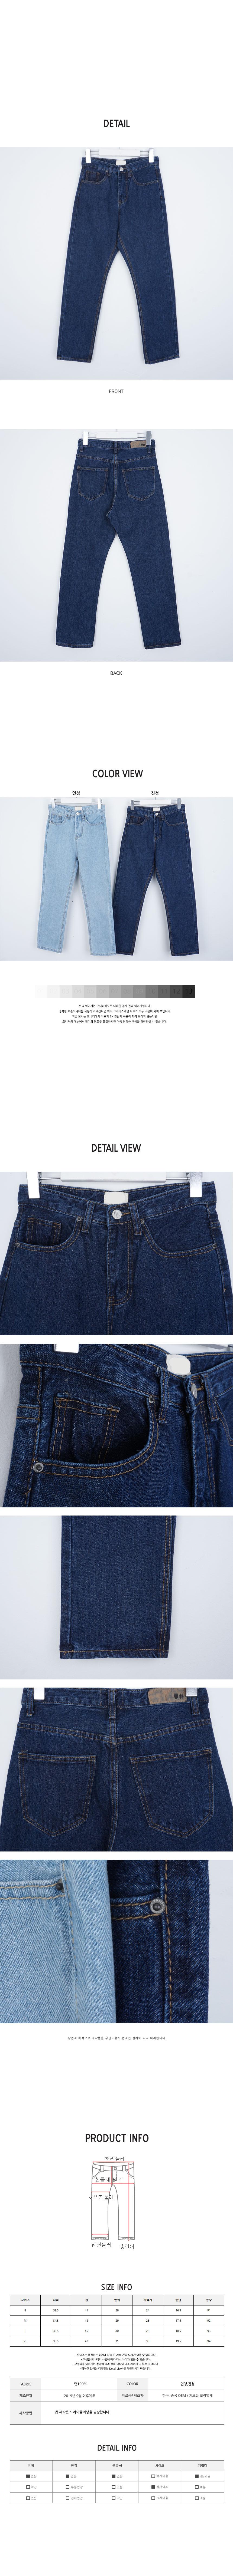 Trade slim denim jeans